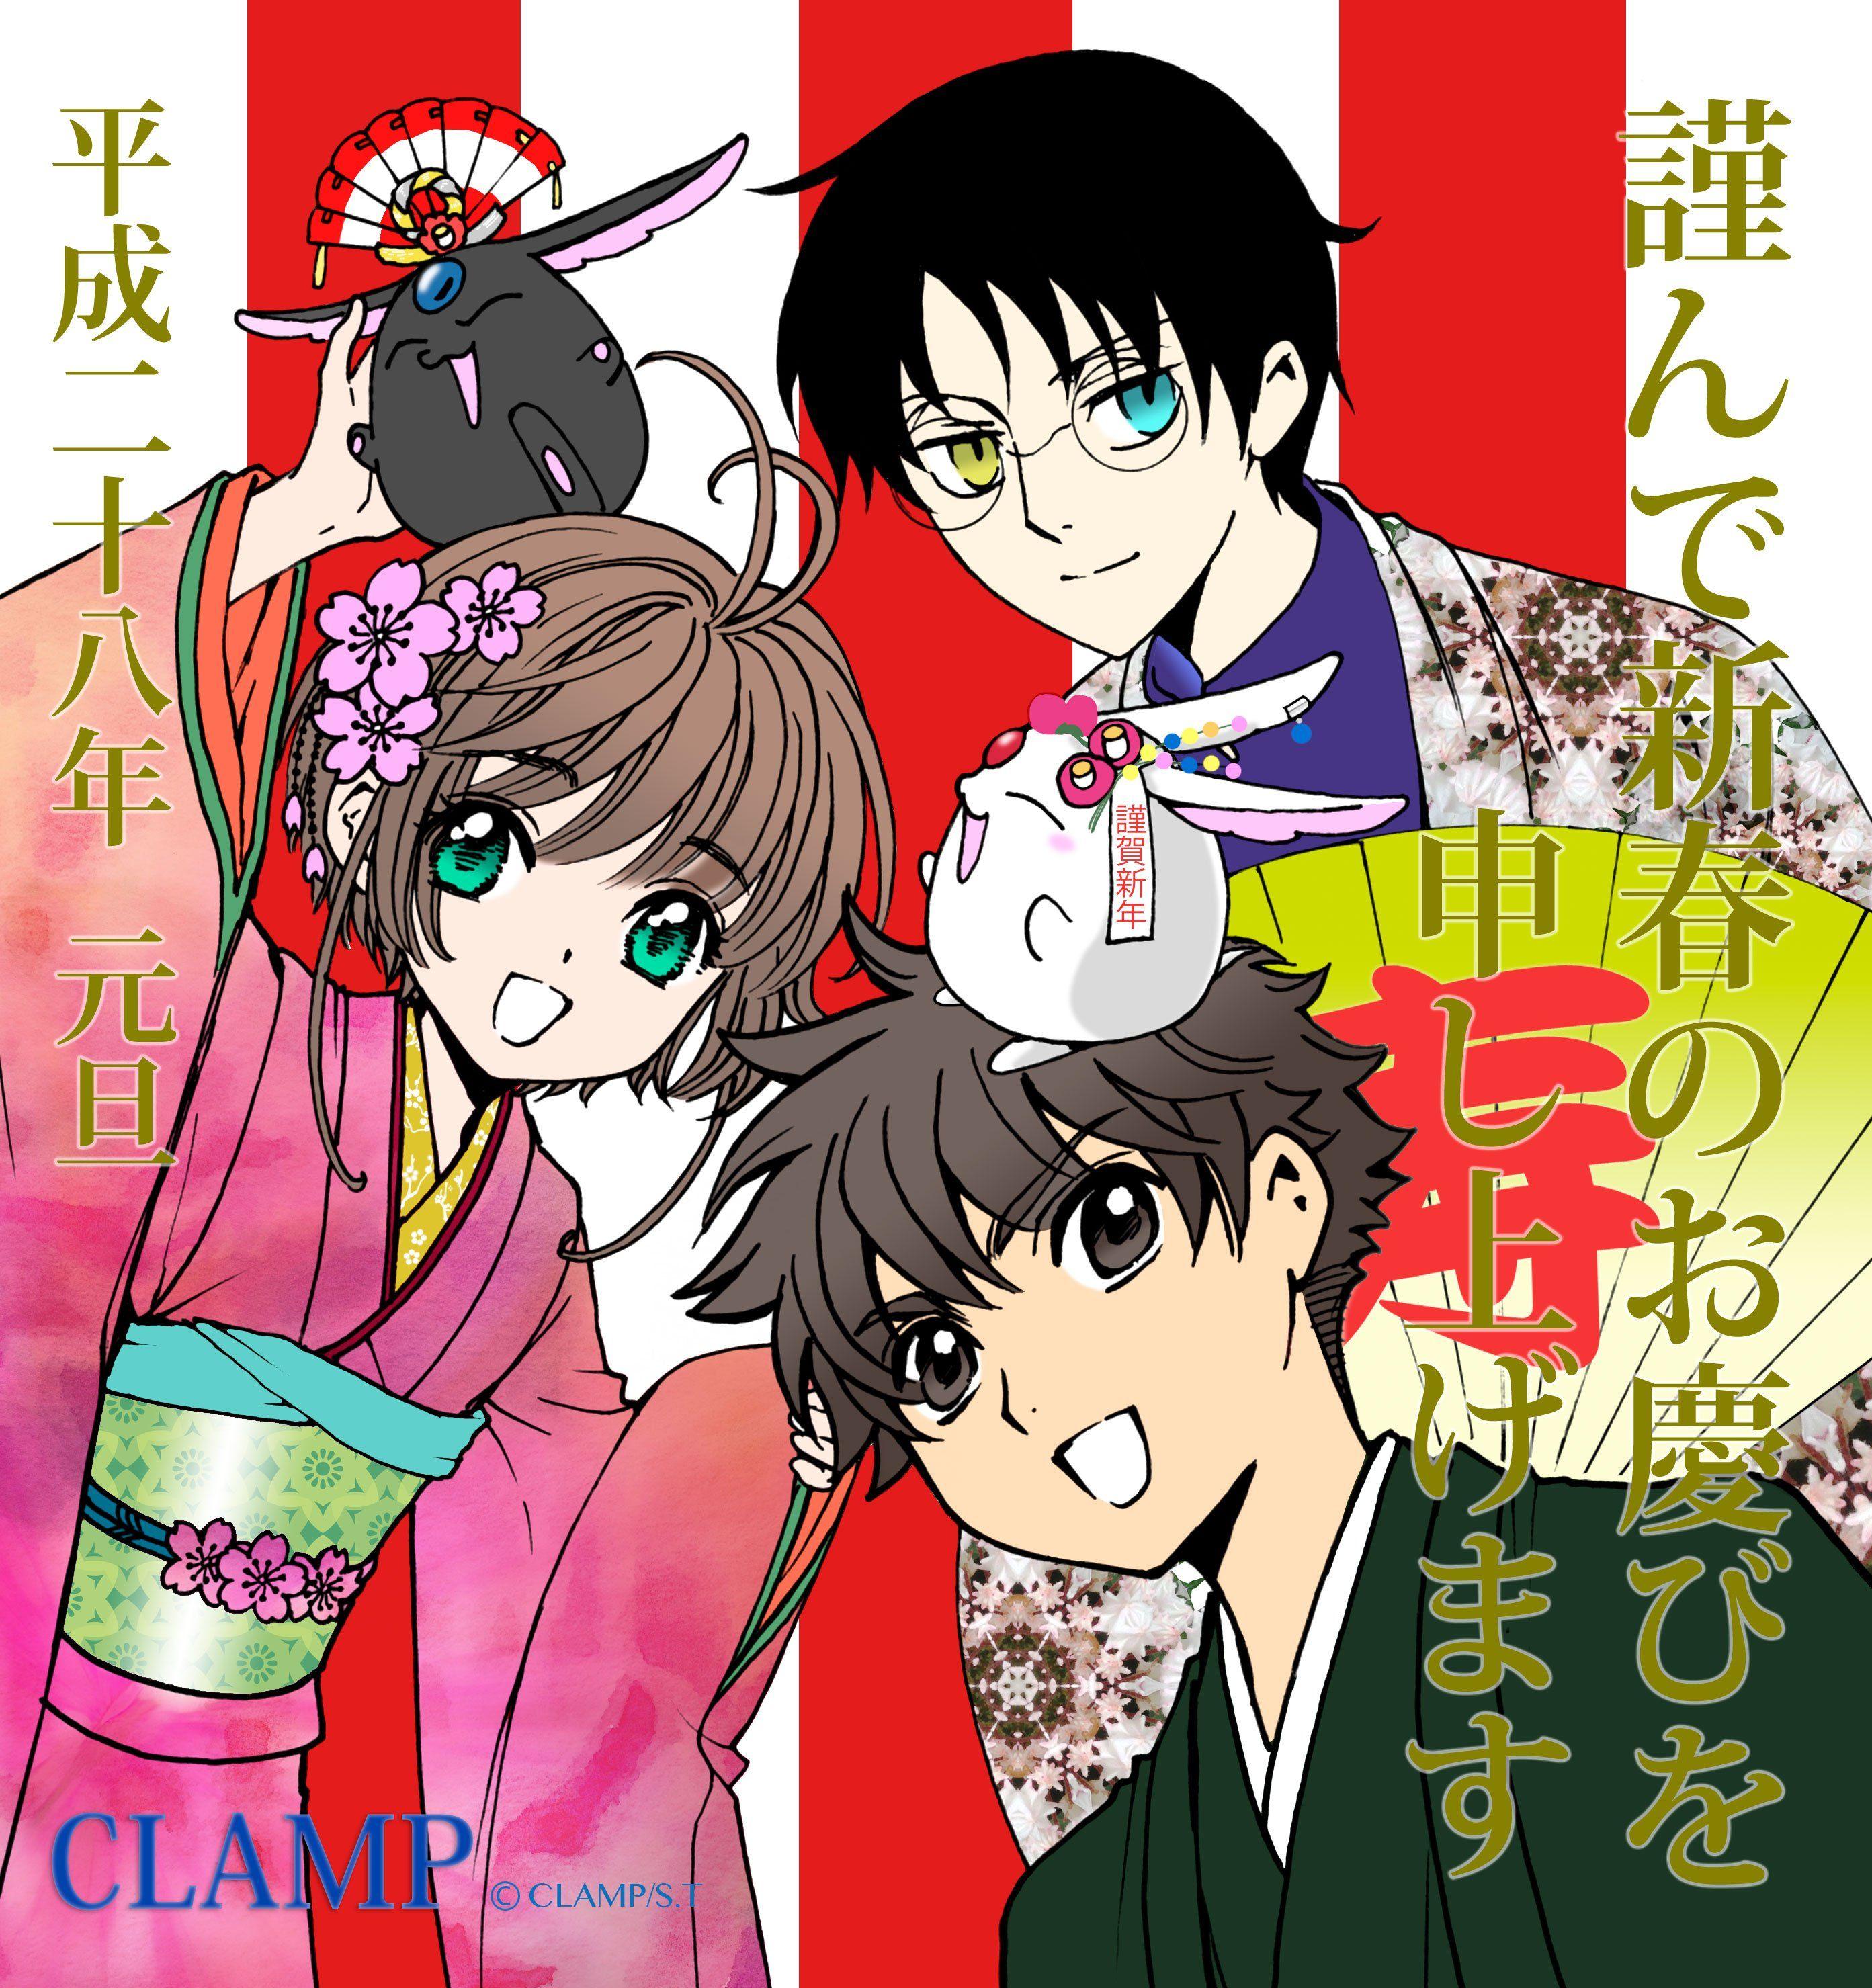 Xxxholic Cardcaptor Sakura Clamp